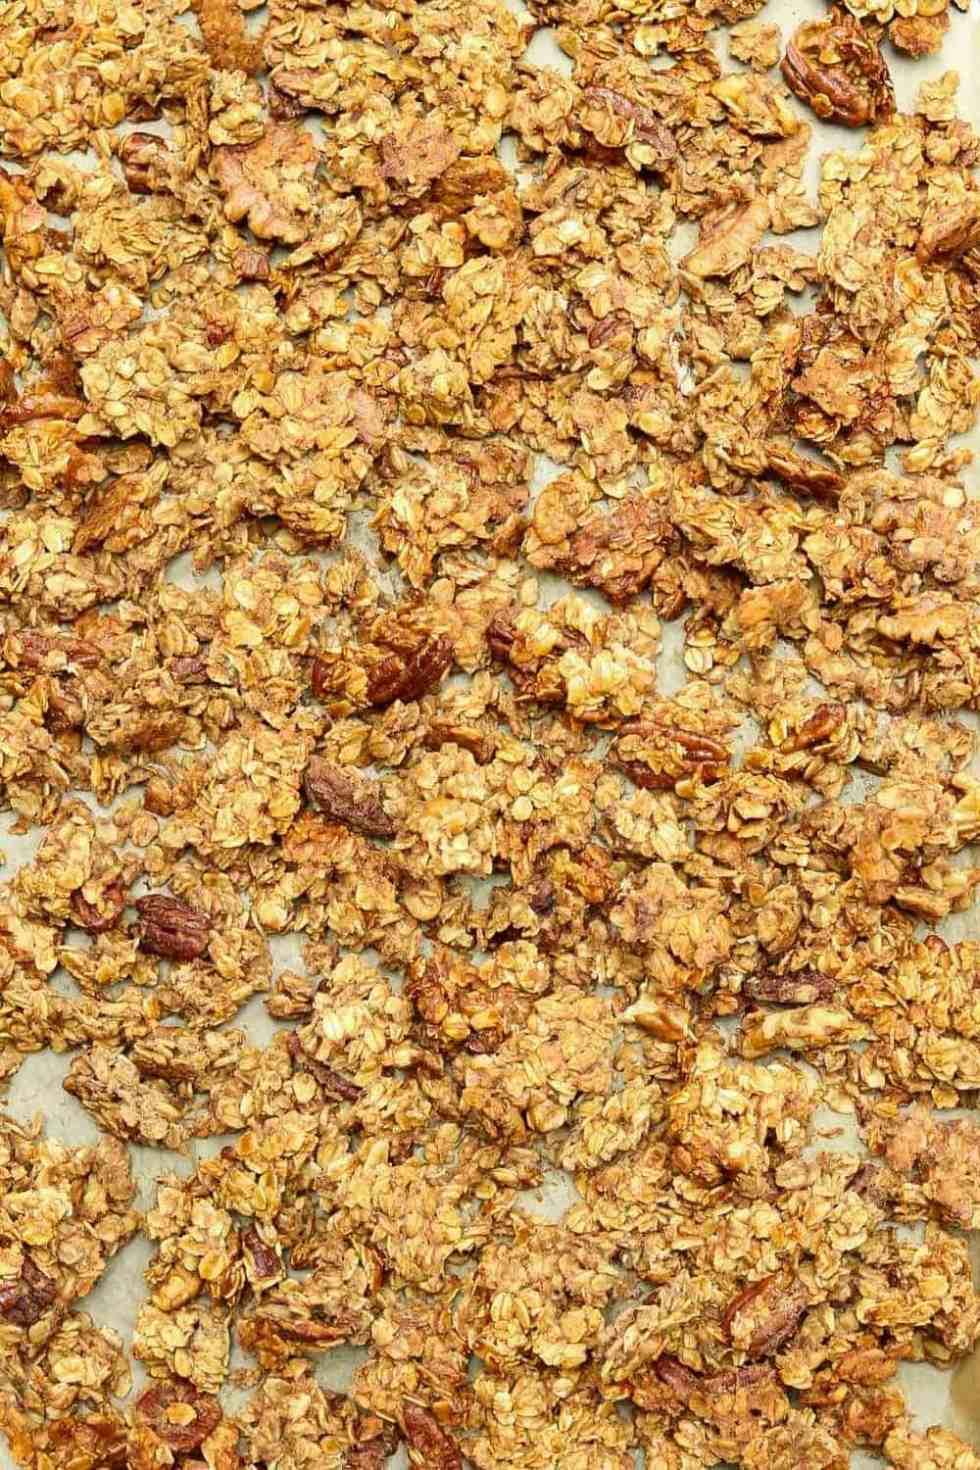 Up close of granola on a baking sheet.